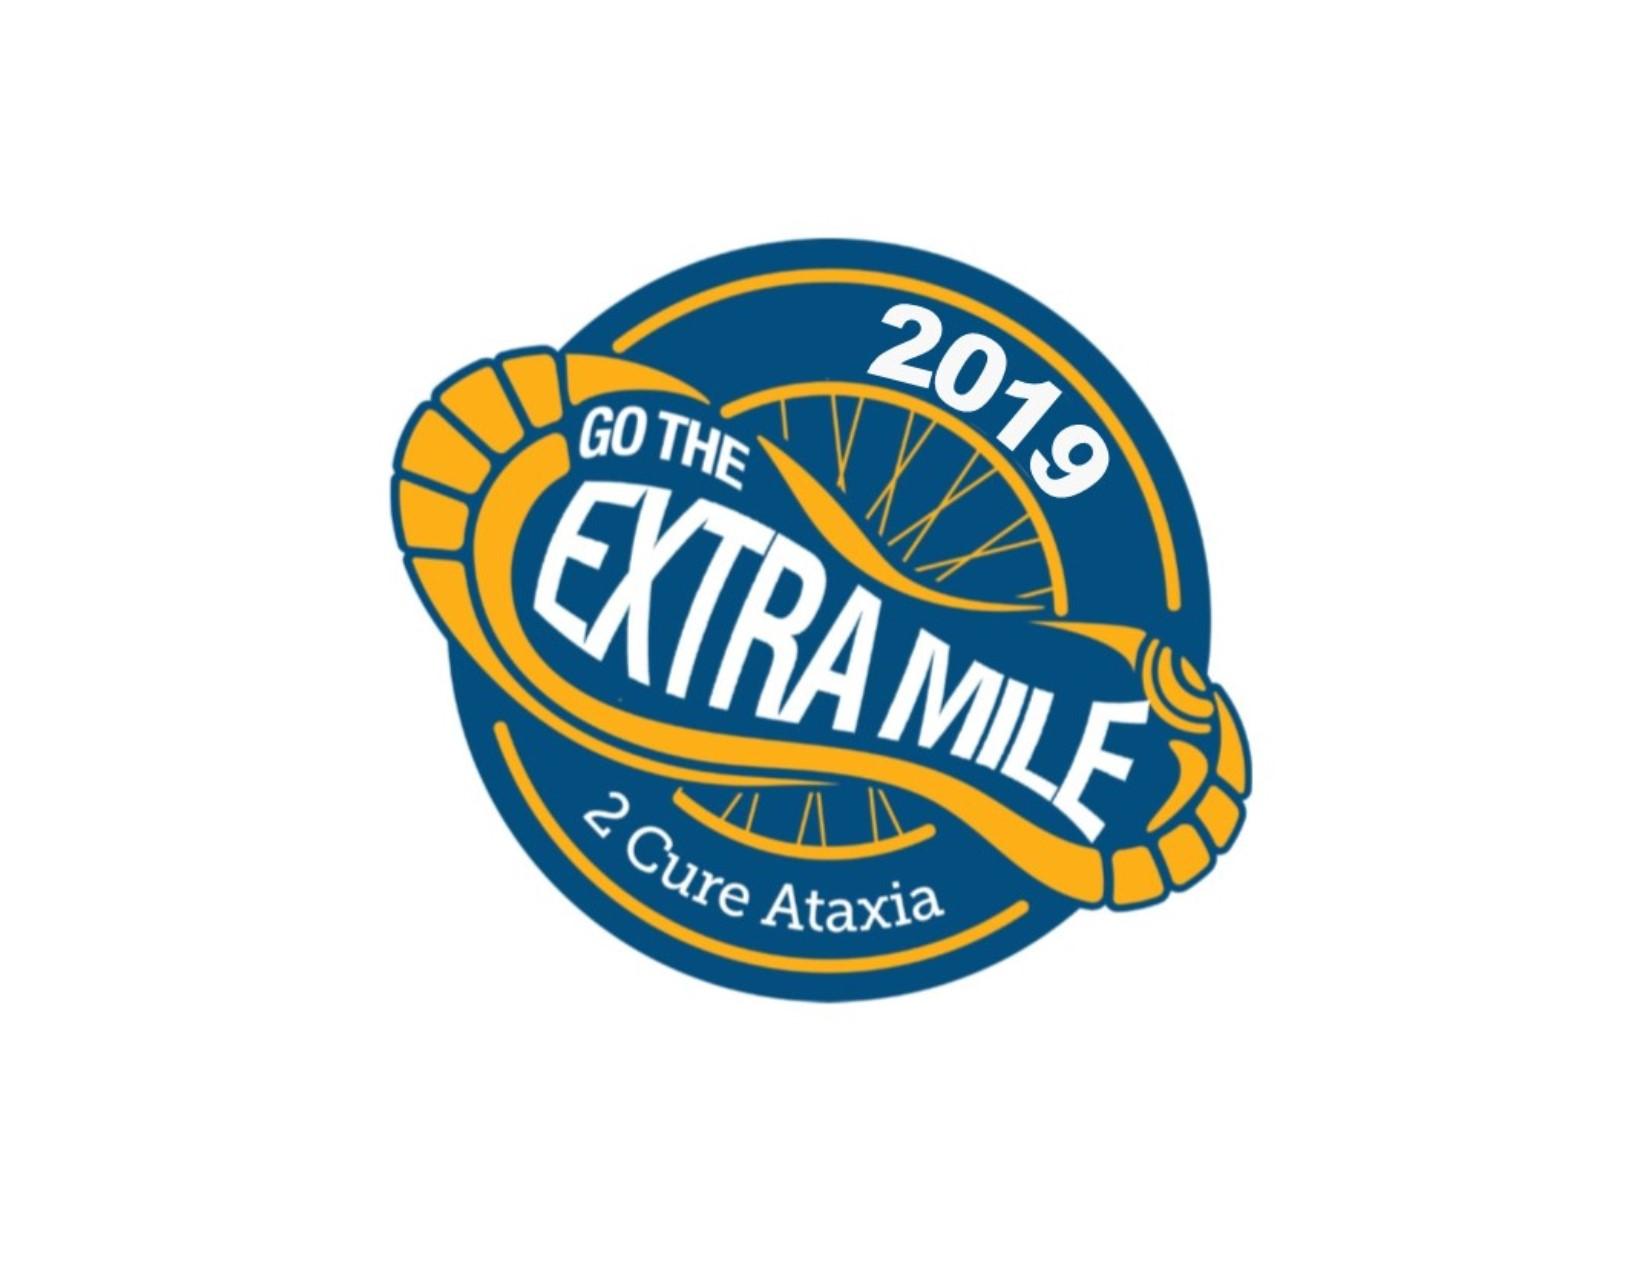 Extra mile logo mc